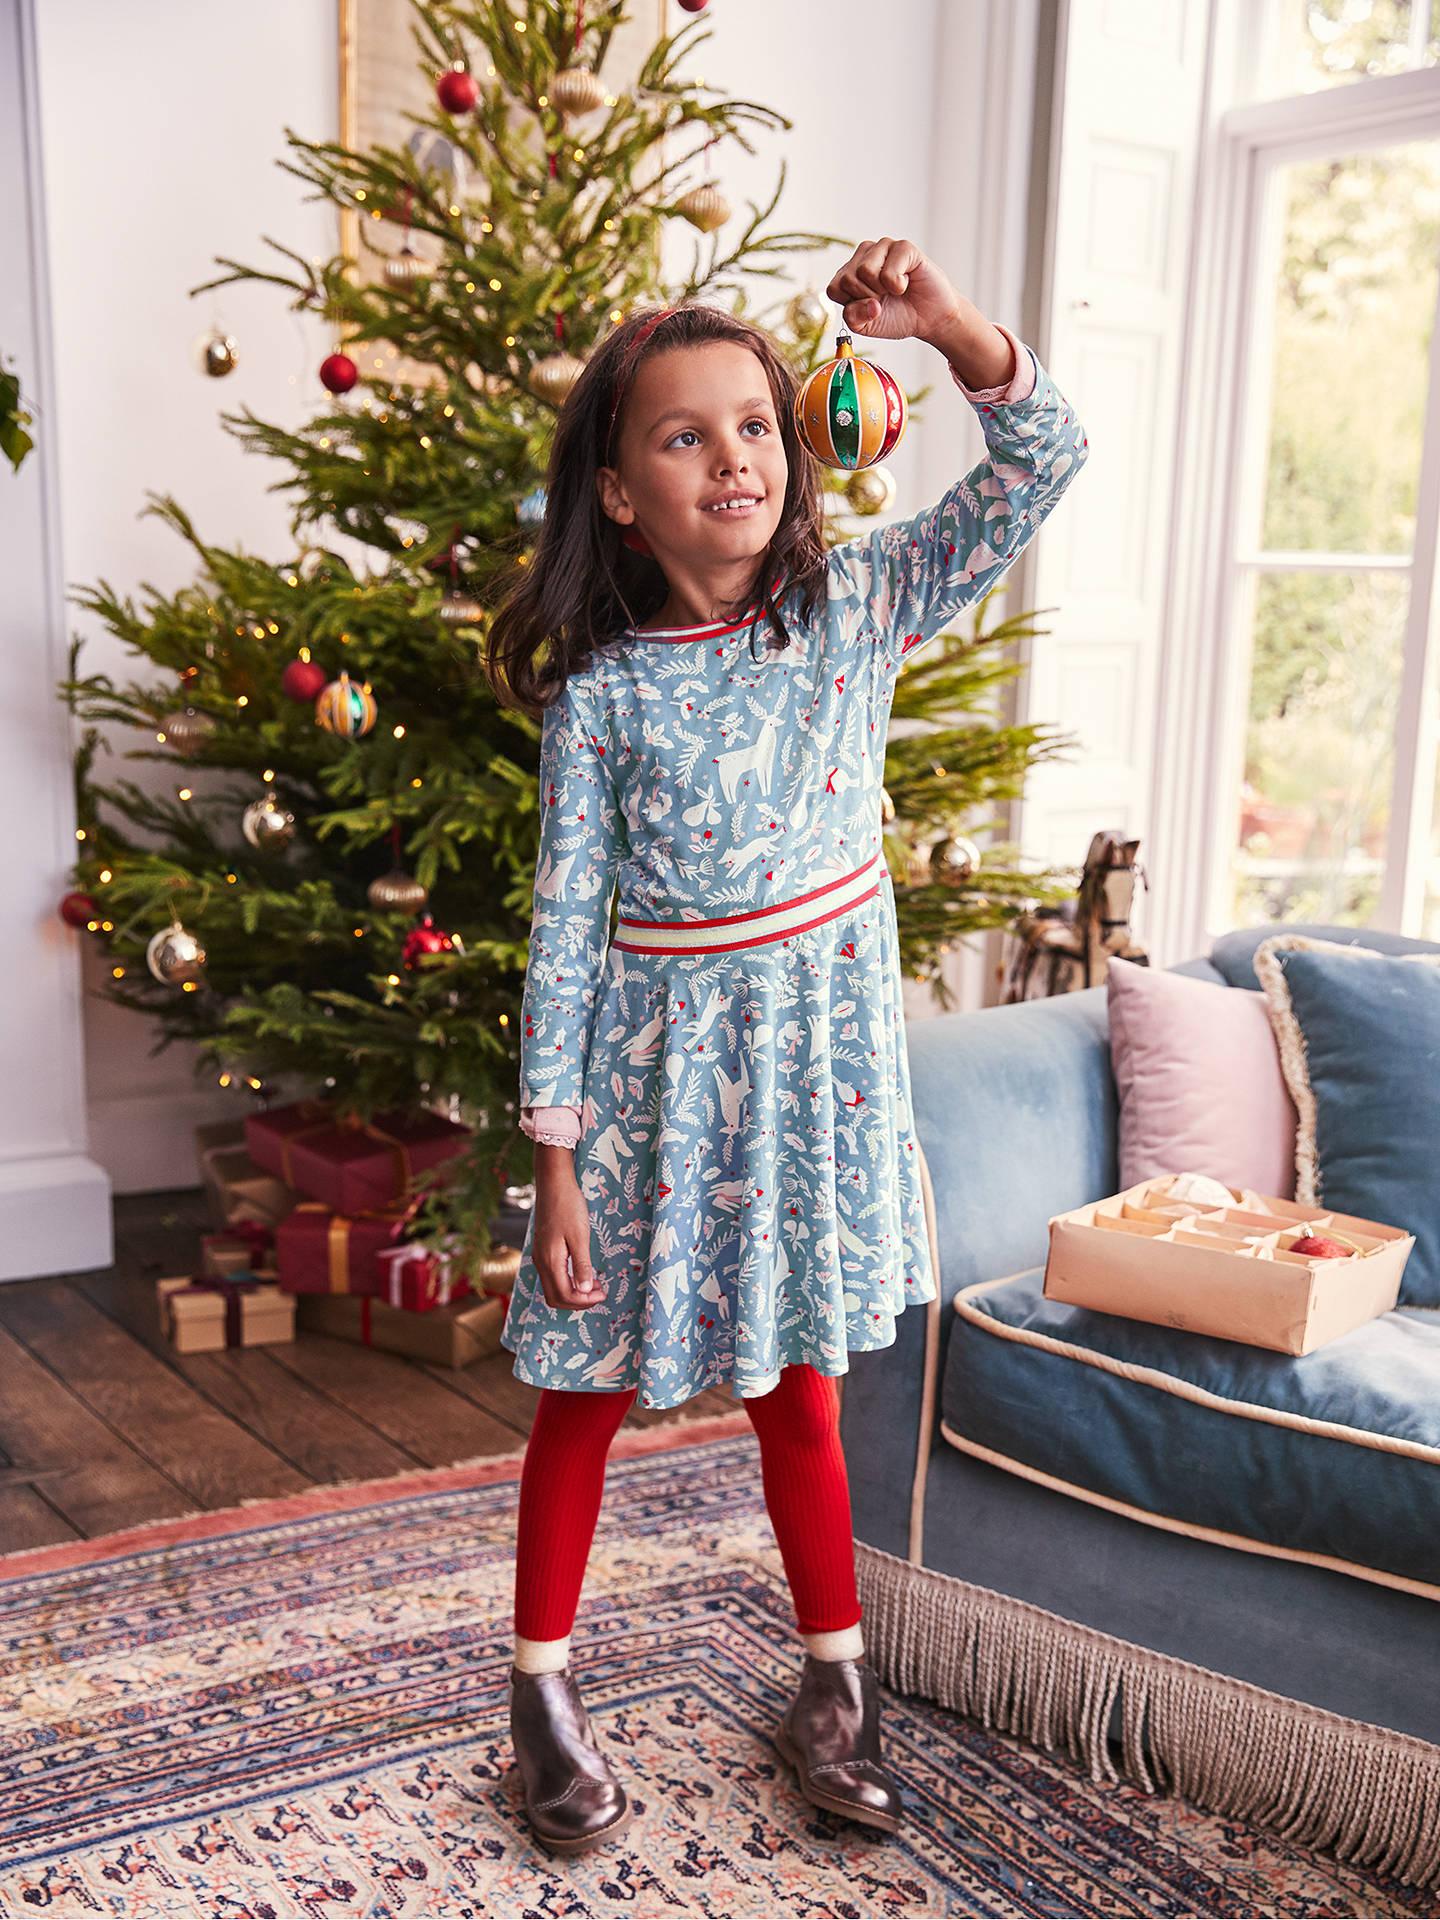 eca69ea52ace9 ... Buy Mini Boden Girls' Woodland Animal Print Jersey Dress, Blue, 11-12